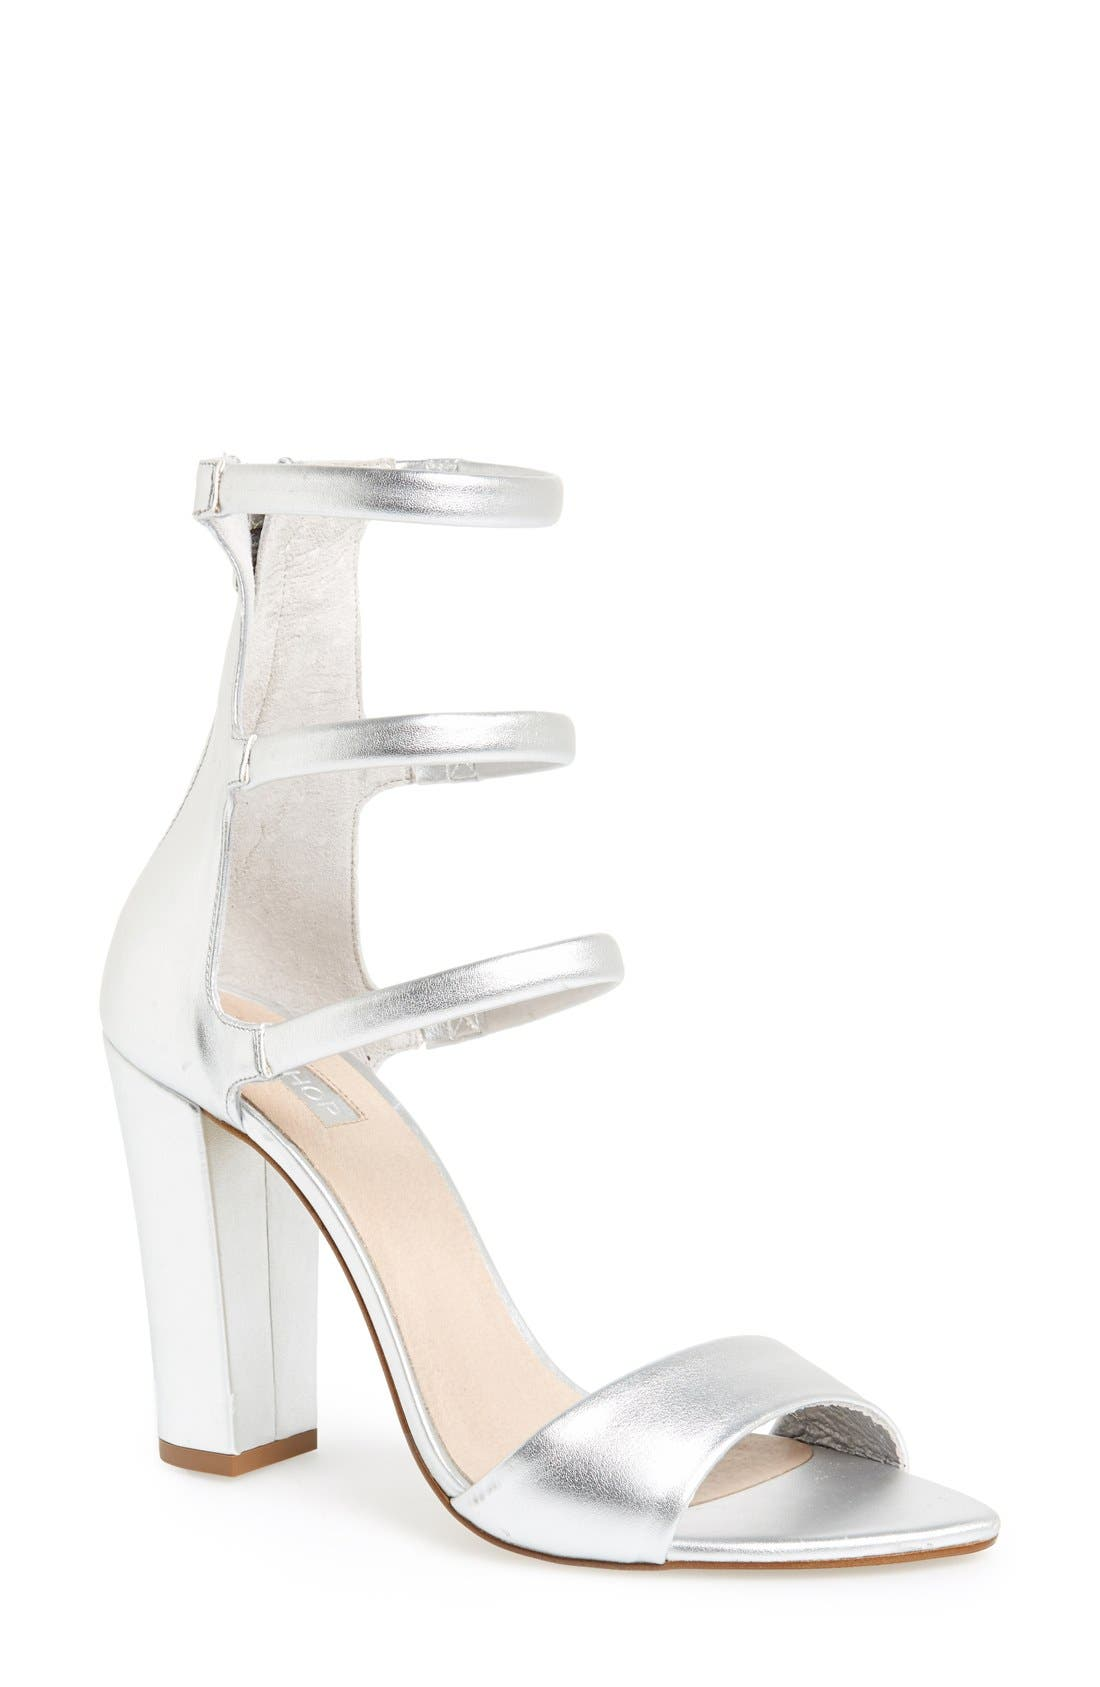 Main Image - Topshop 'Romy' Sandal